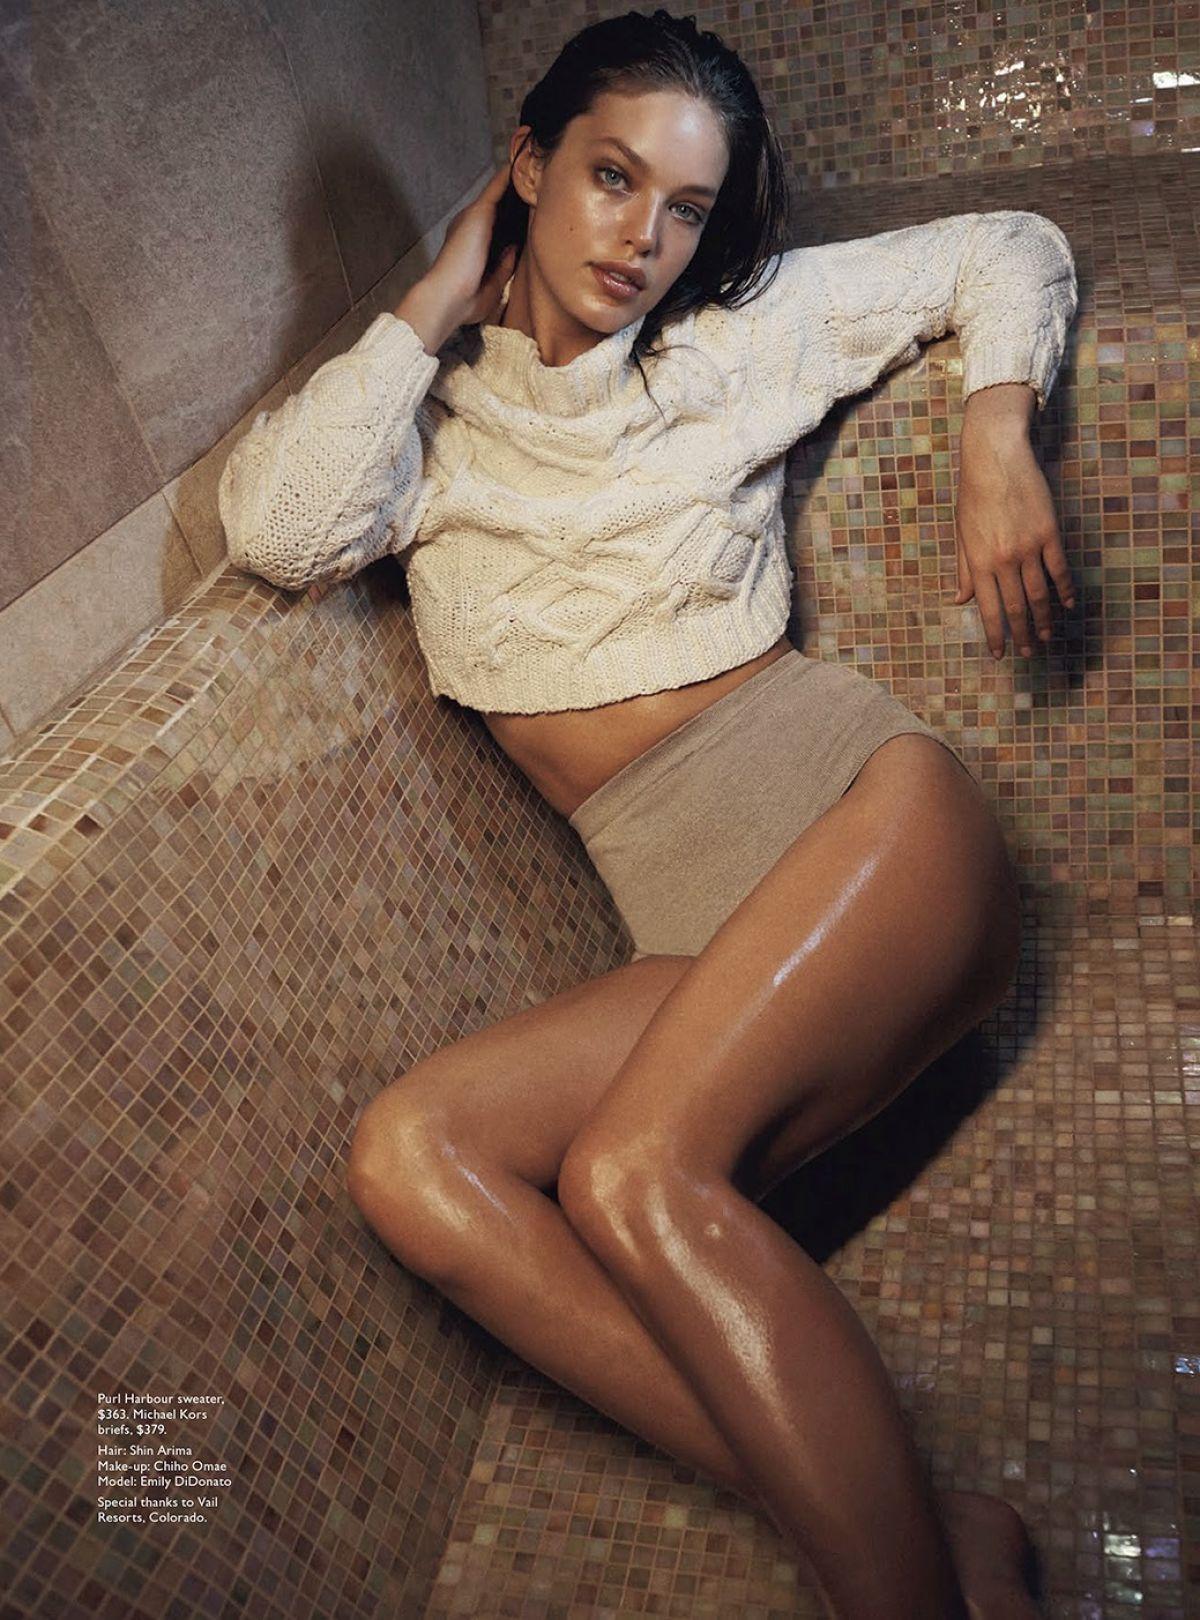 EMILY DIDONATO in Vogue Magazine, June 2014 Issue